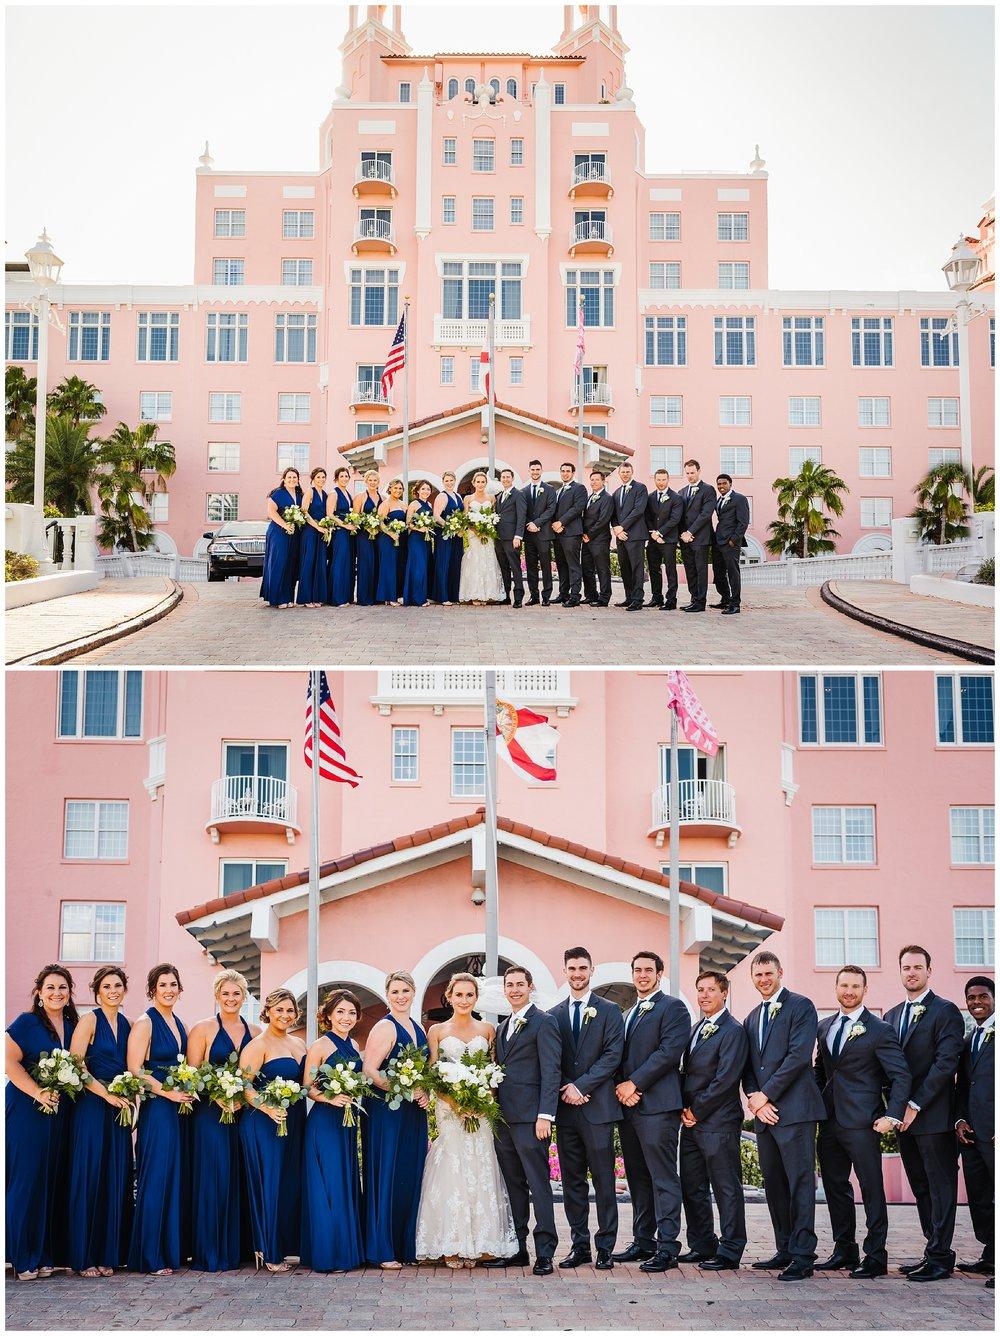 Tampa-wedding-photographer-bella-fleur-orchid-boquet-rsvb-events_0011.jpg